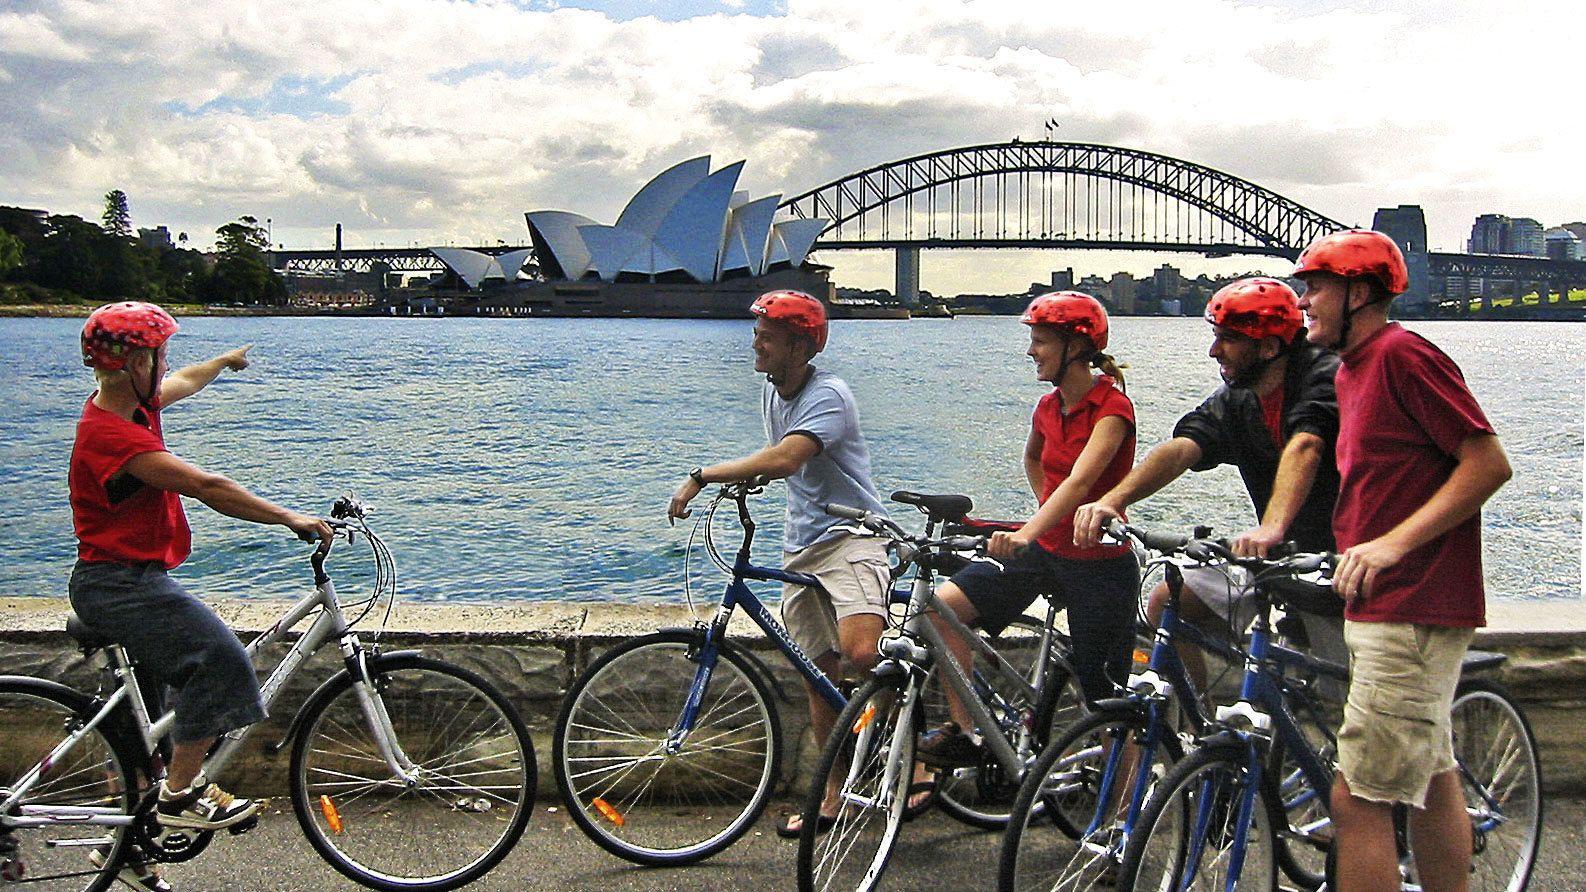 People talking about Sydney Opera house on Sydney classic bike tour in Australia